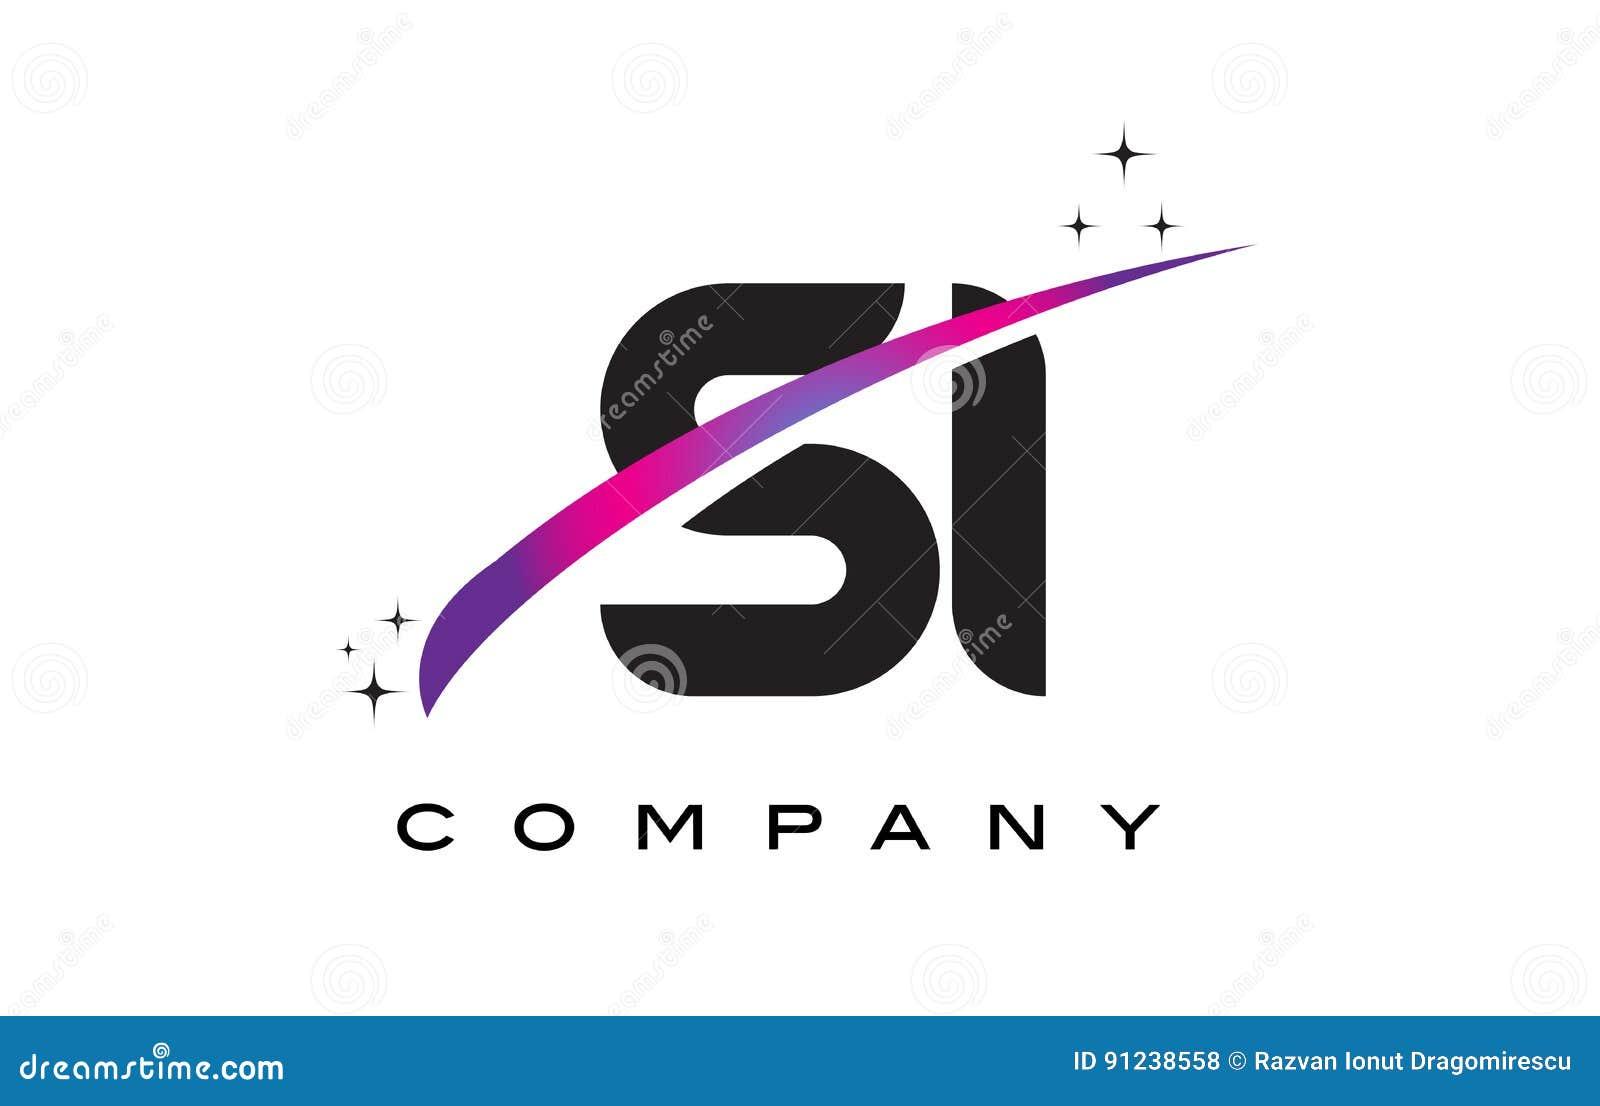 SI S I Black Letter Logo Design with Purple Magenta Swoosh